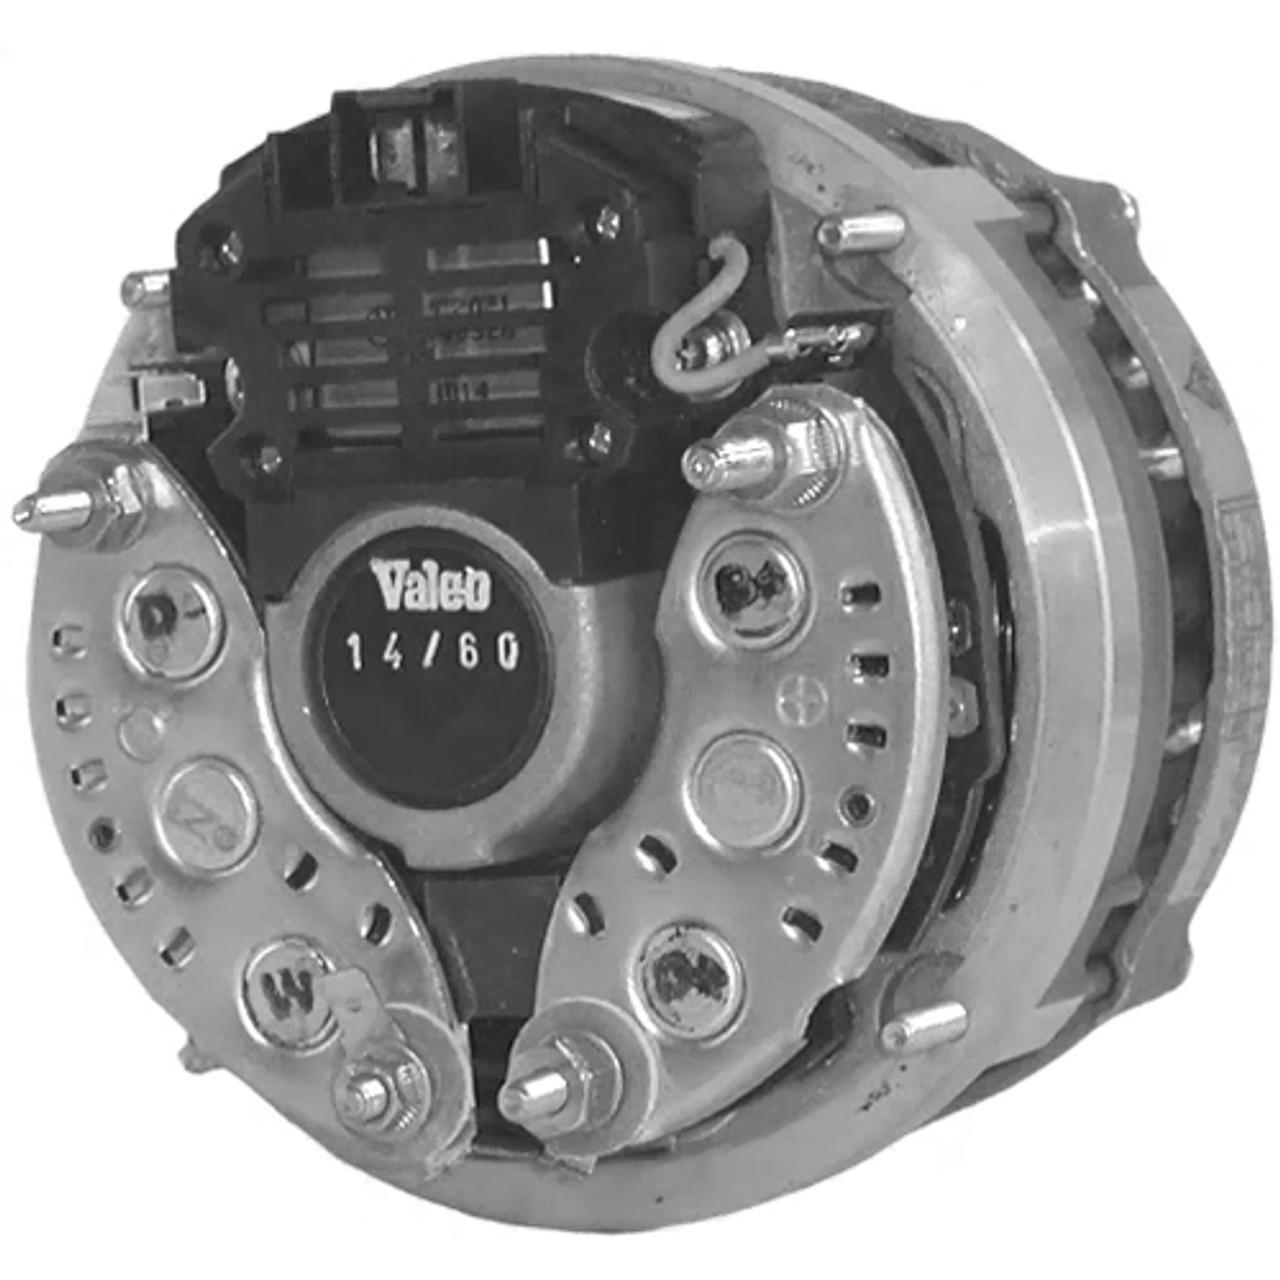 [DIAGRAM_3ER]  Deutz PL01011 Mas Alternator 12302 | Deutz Alternator Wiring Diagram |  | Miami Alternators